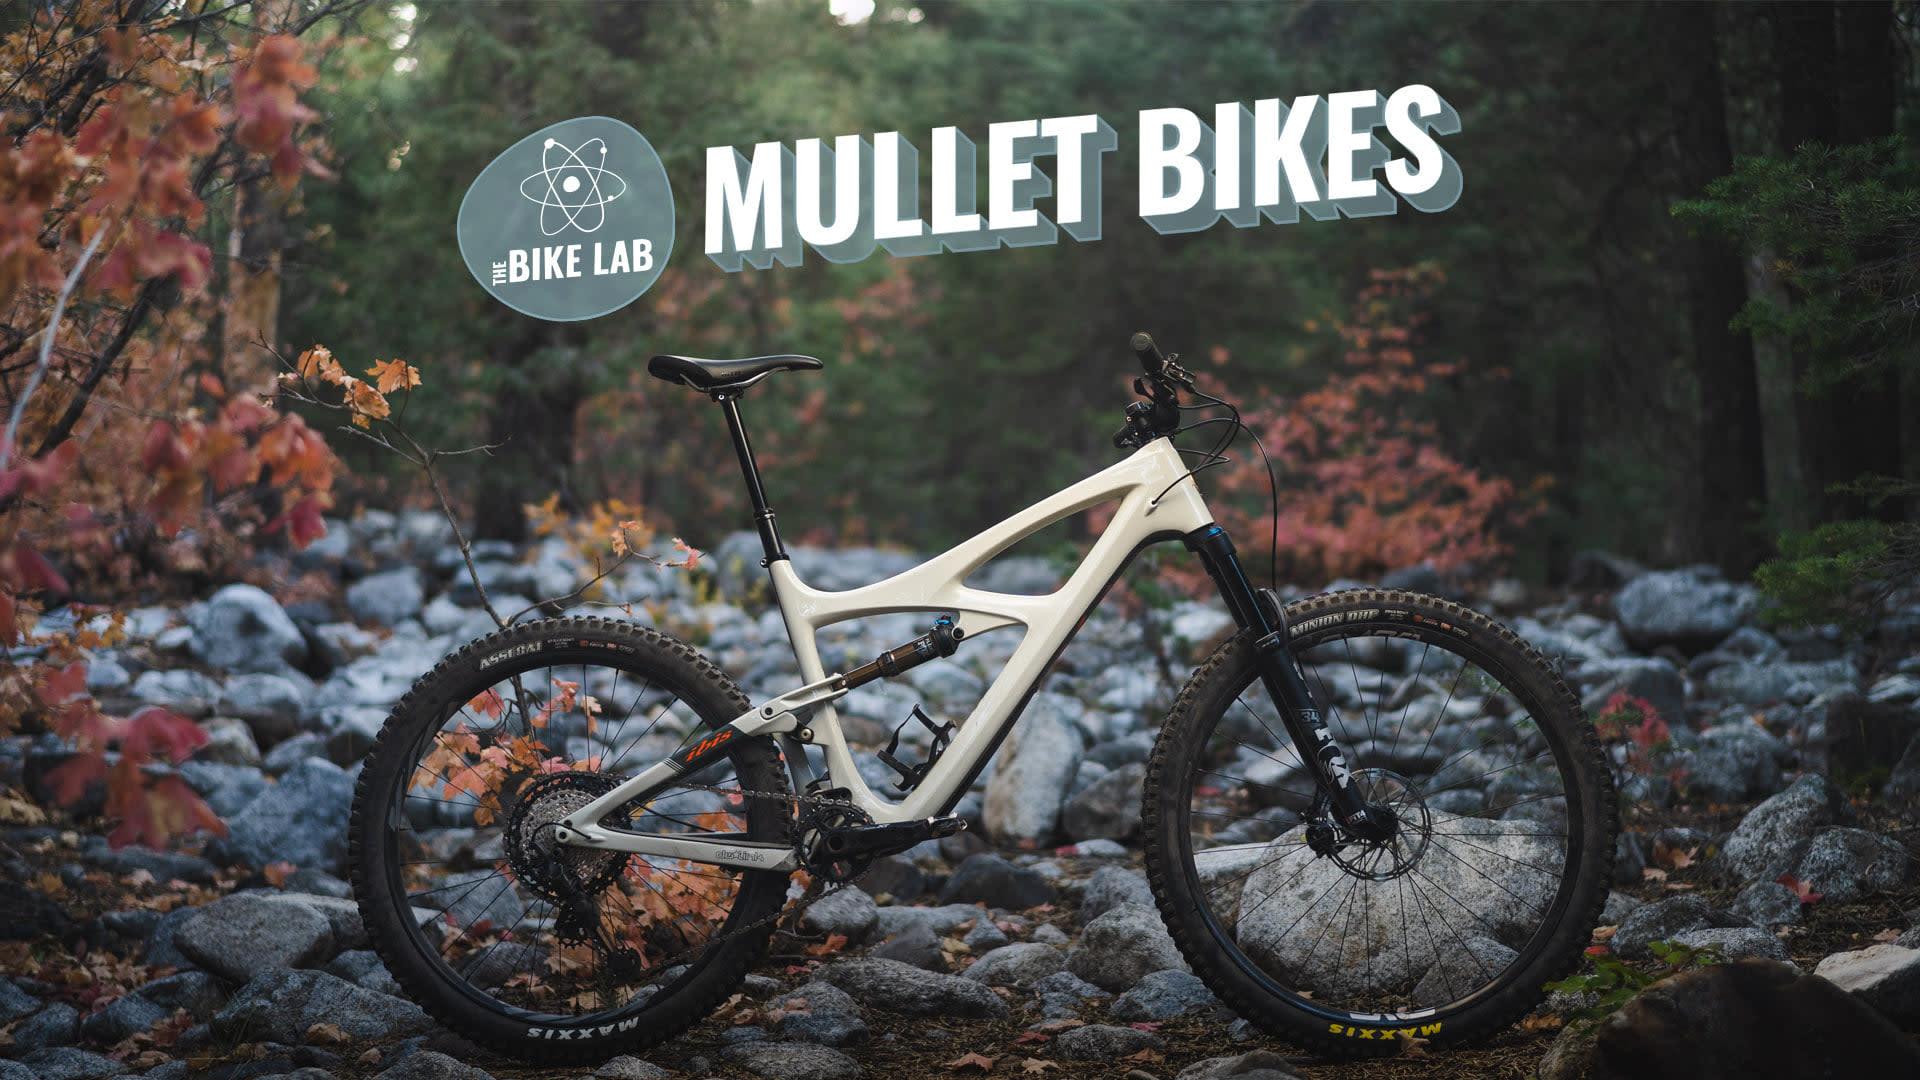 Mullet Bikes